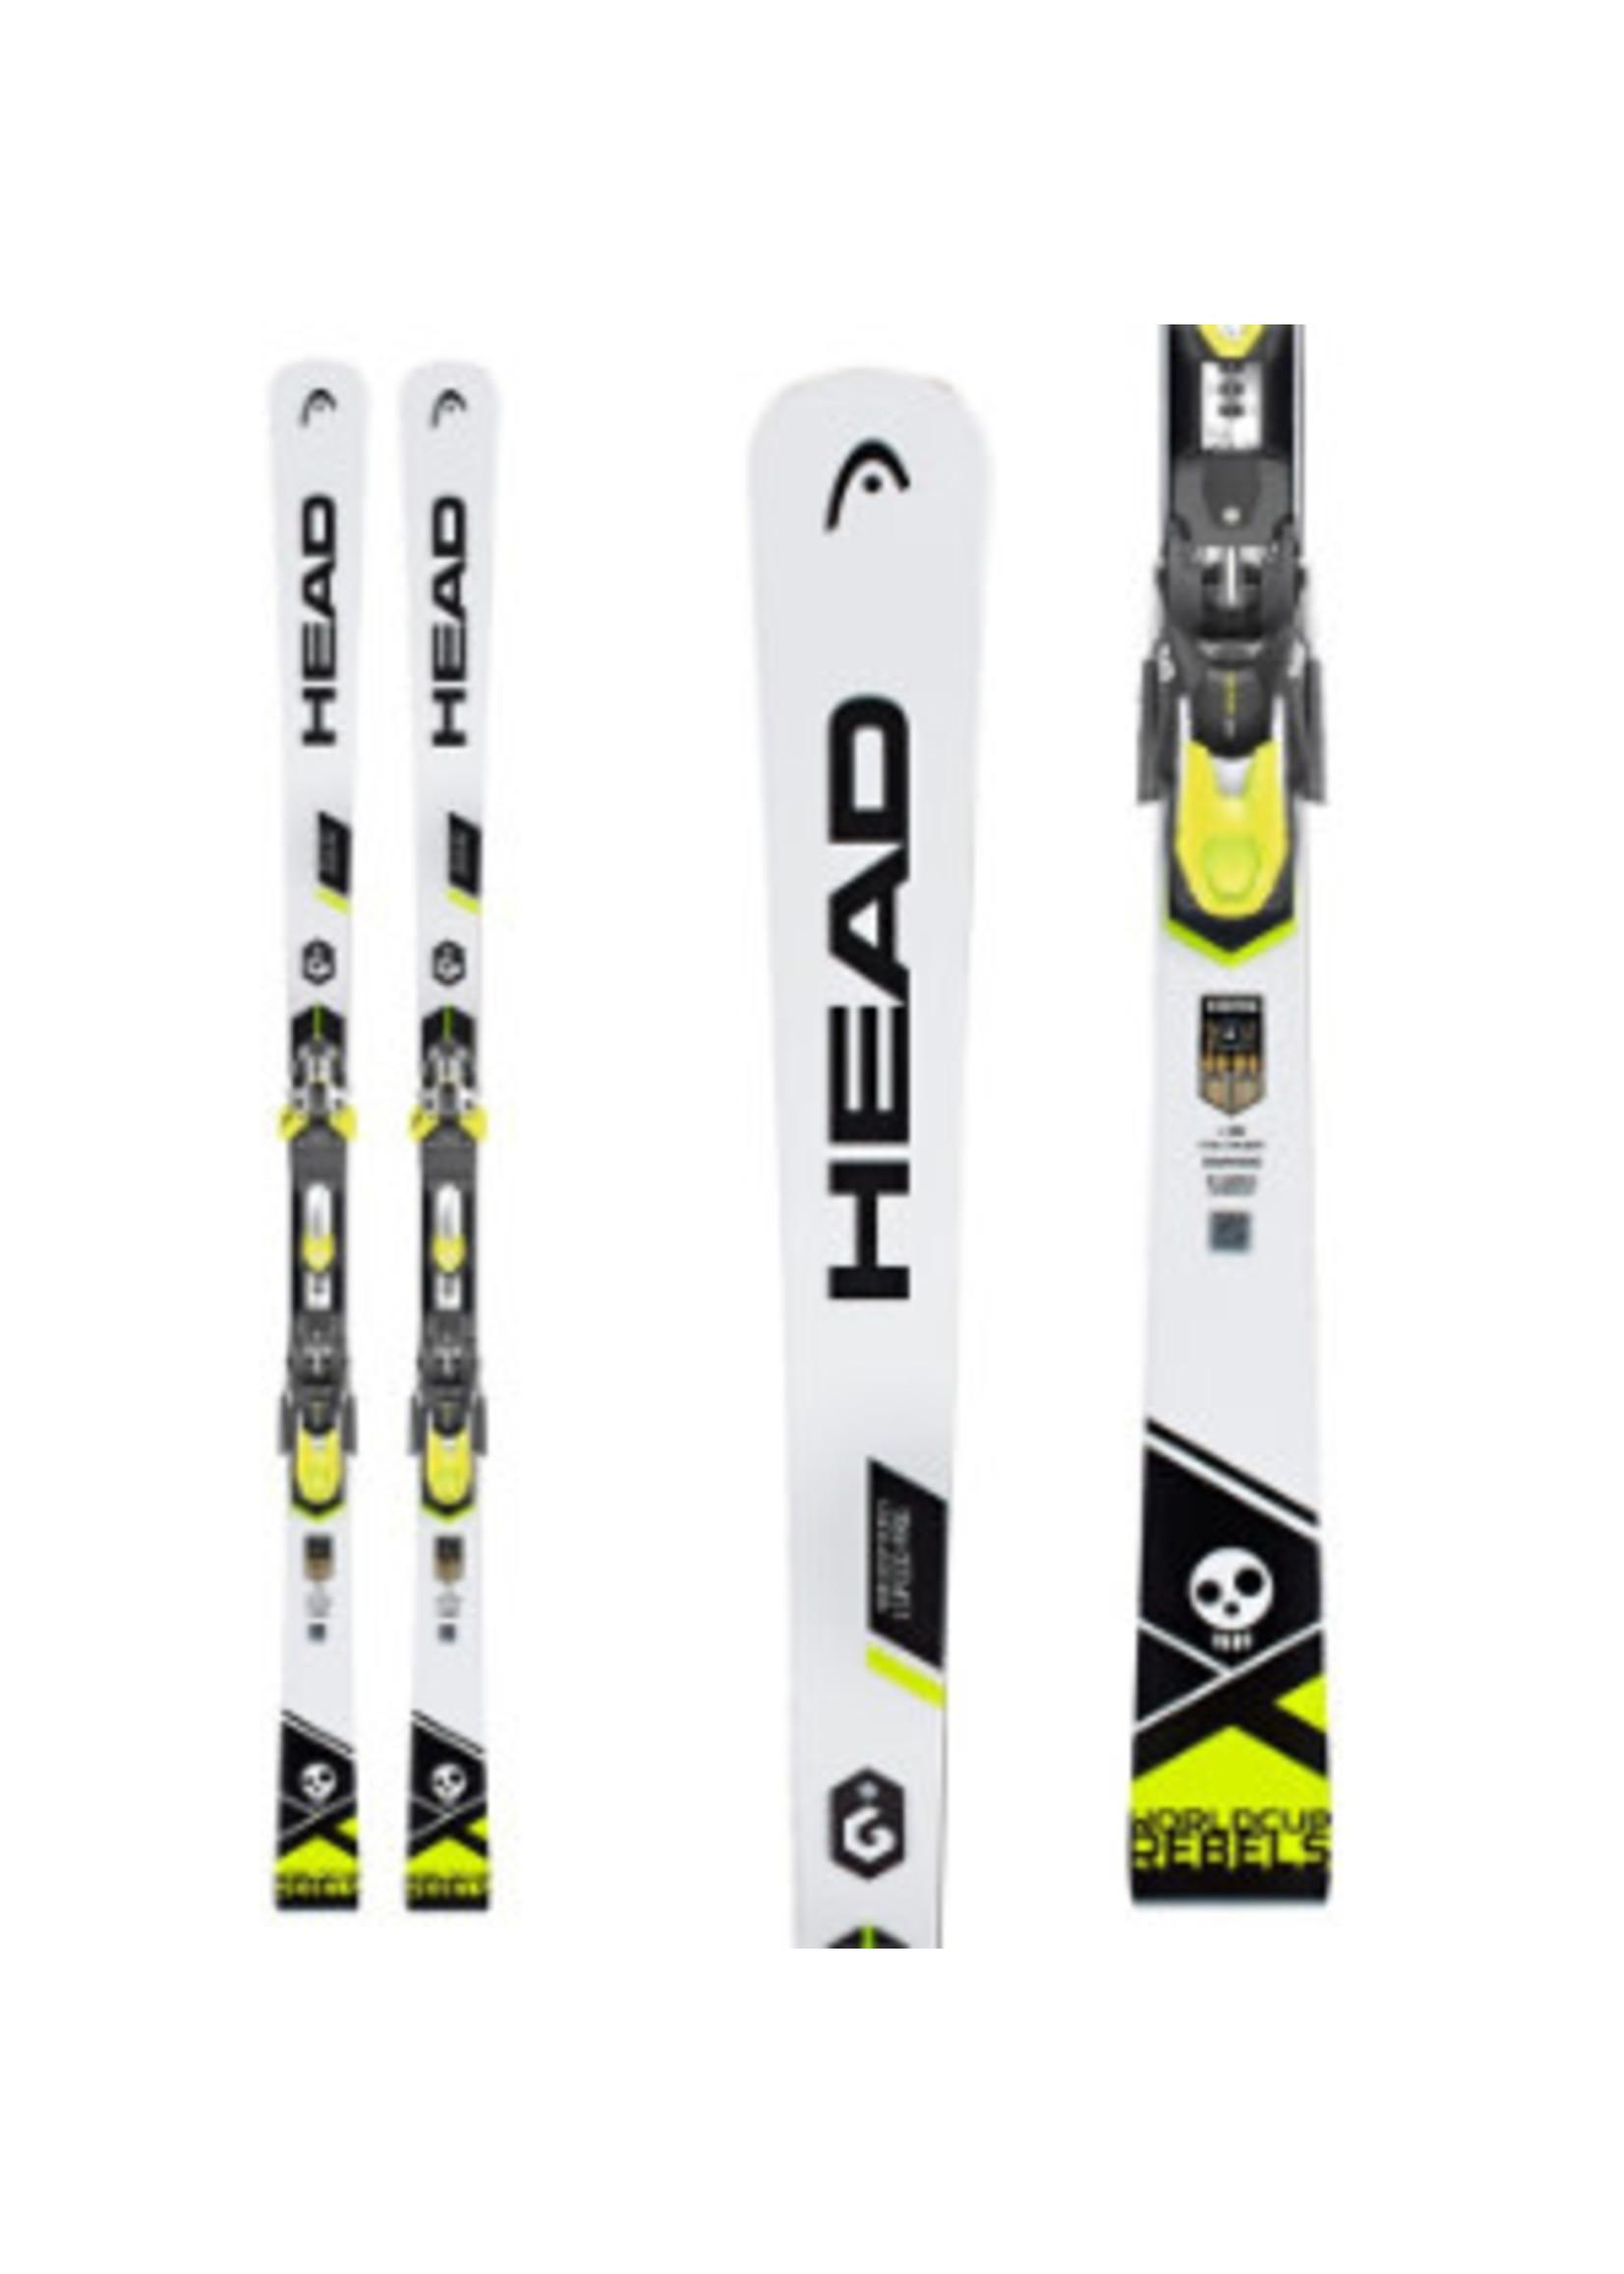 Head Race Ski Worldcup Rebels i.Speed Pro